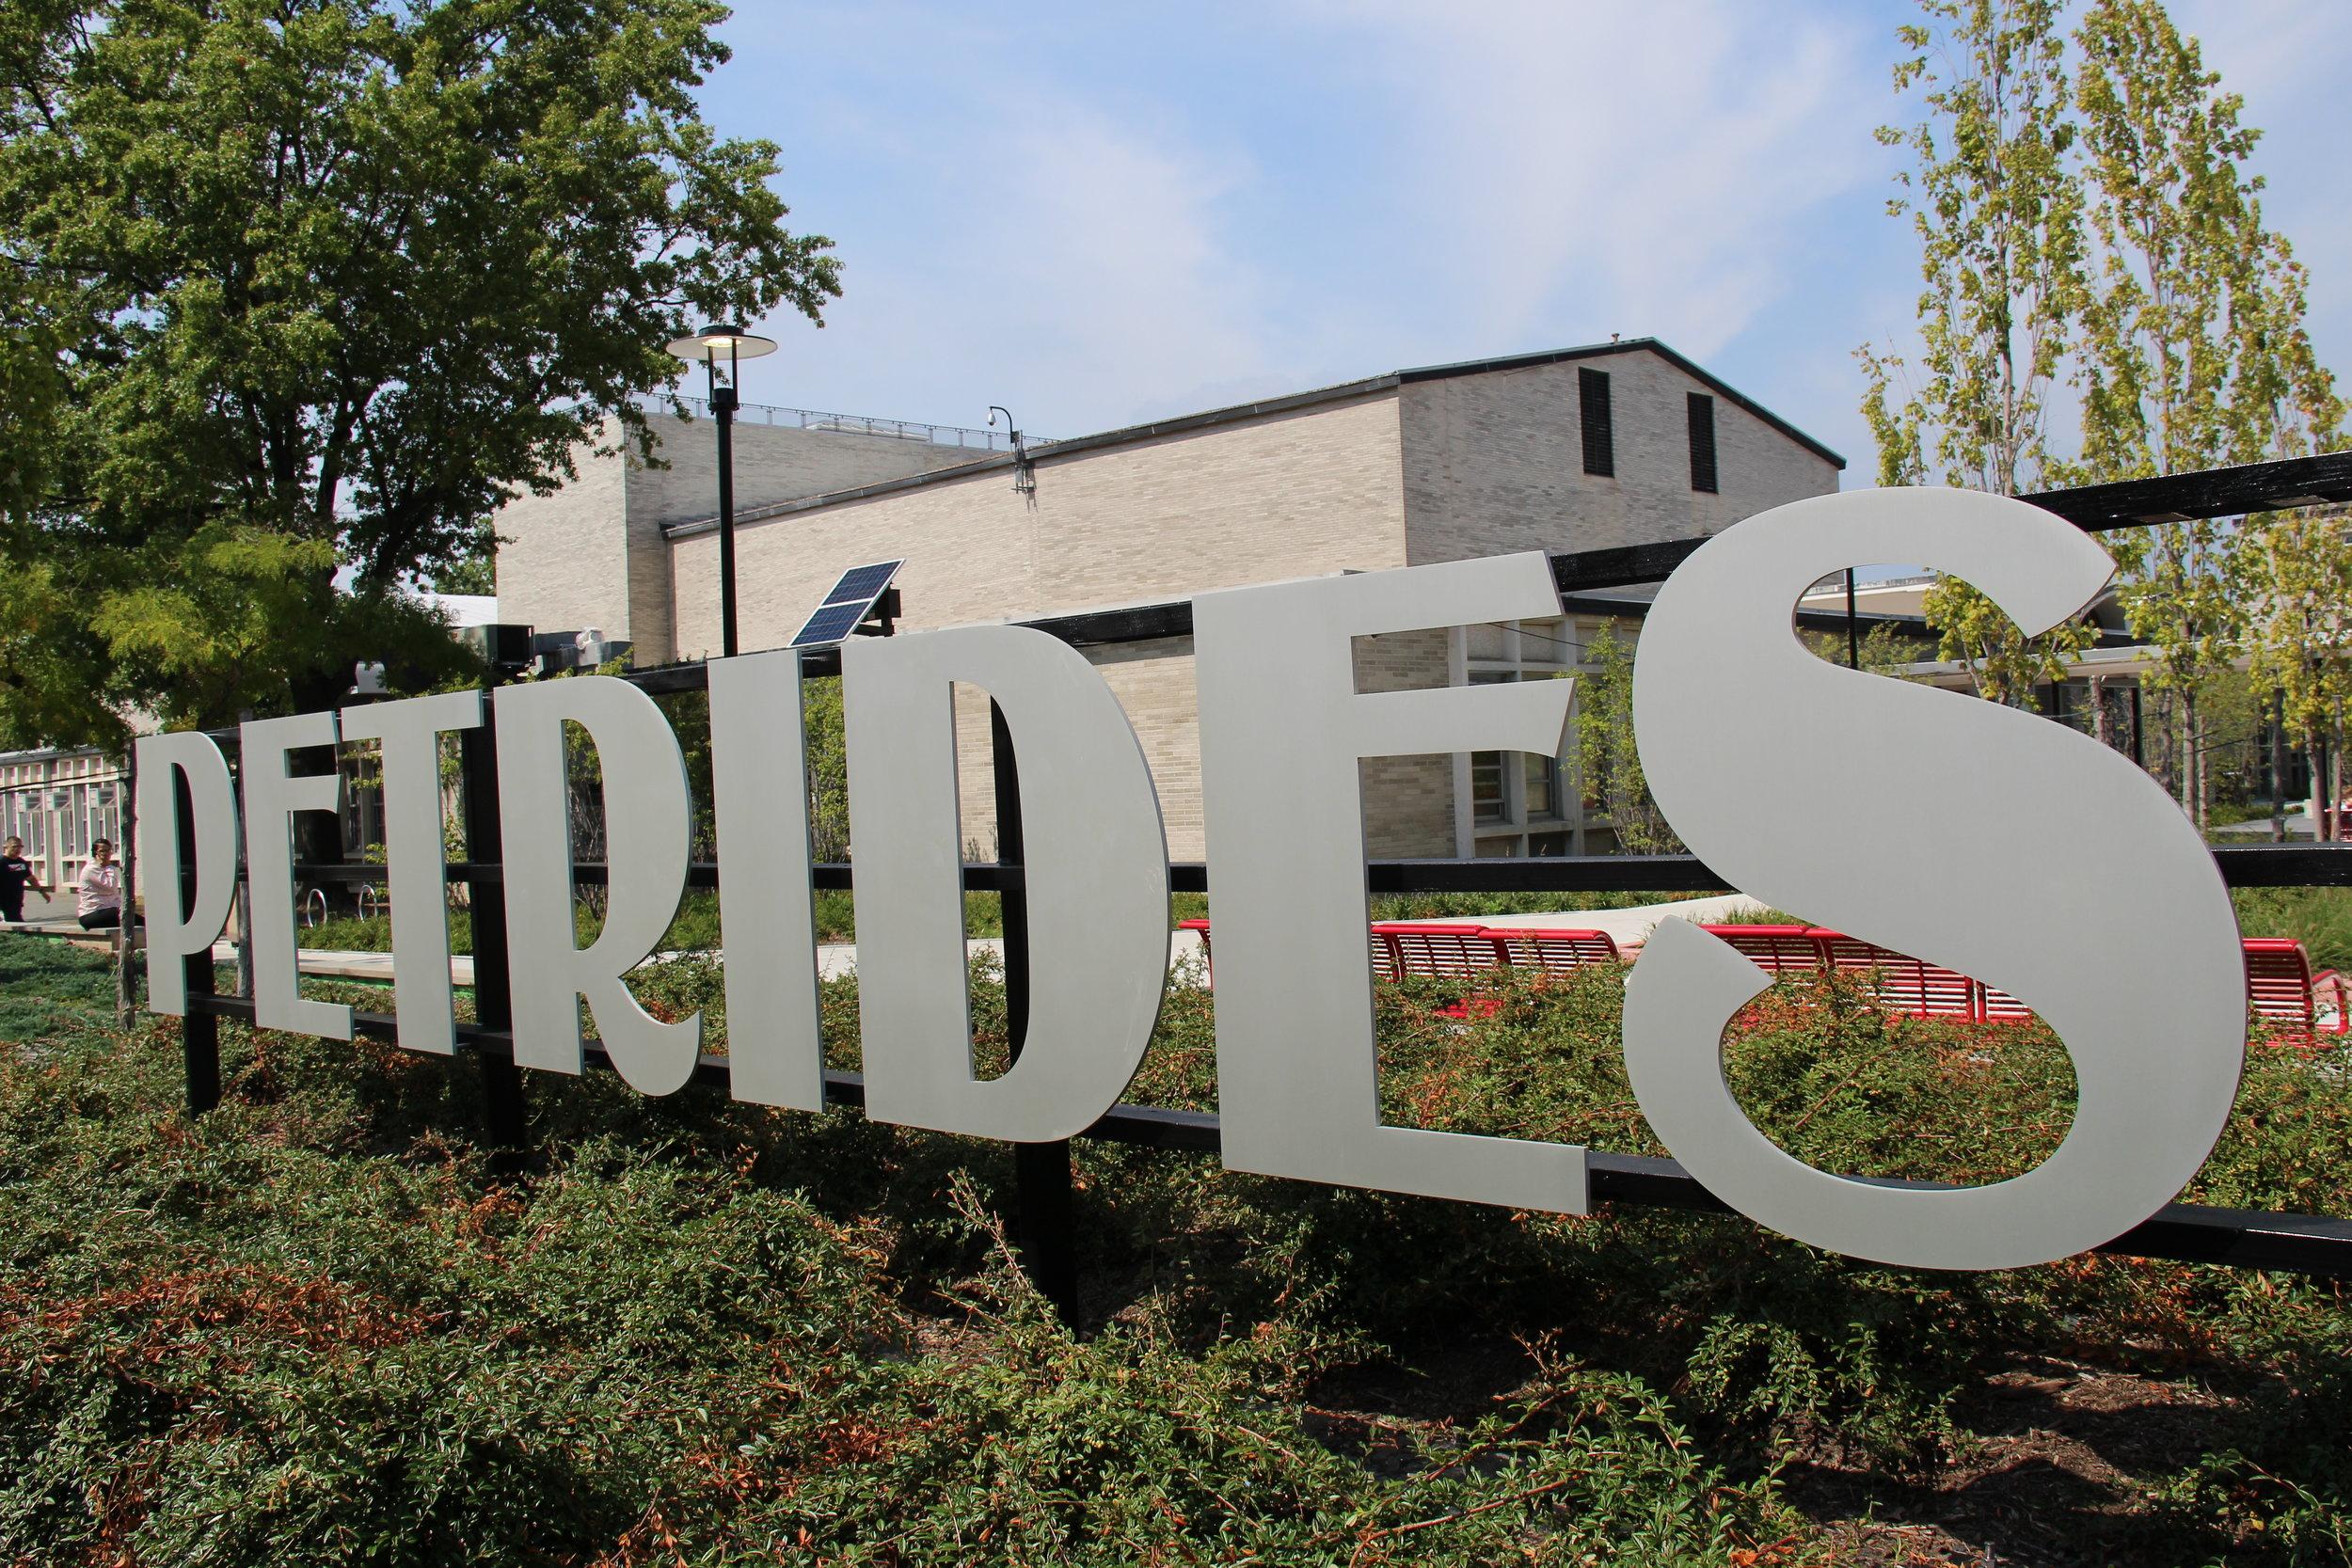 Petrides Sign.JPG